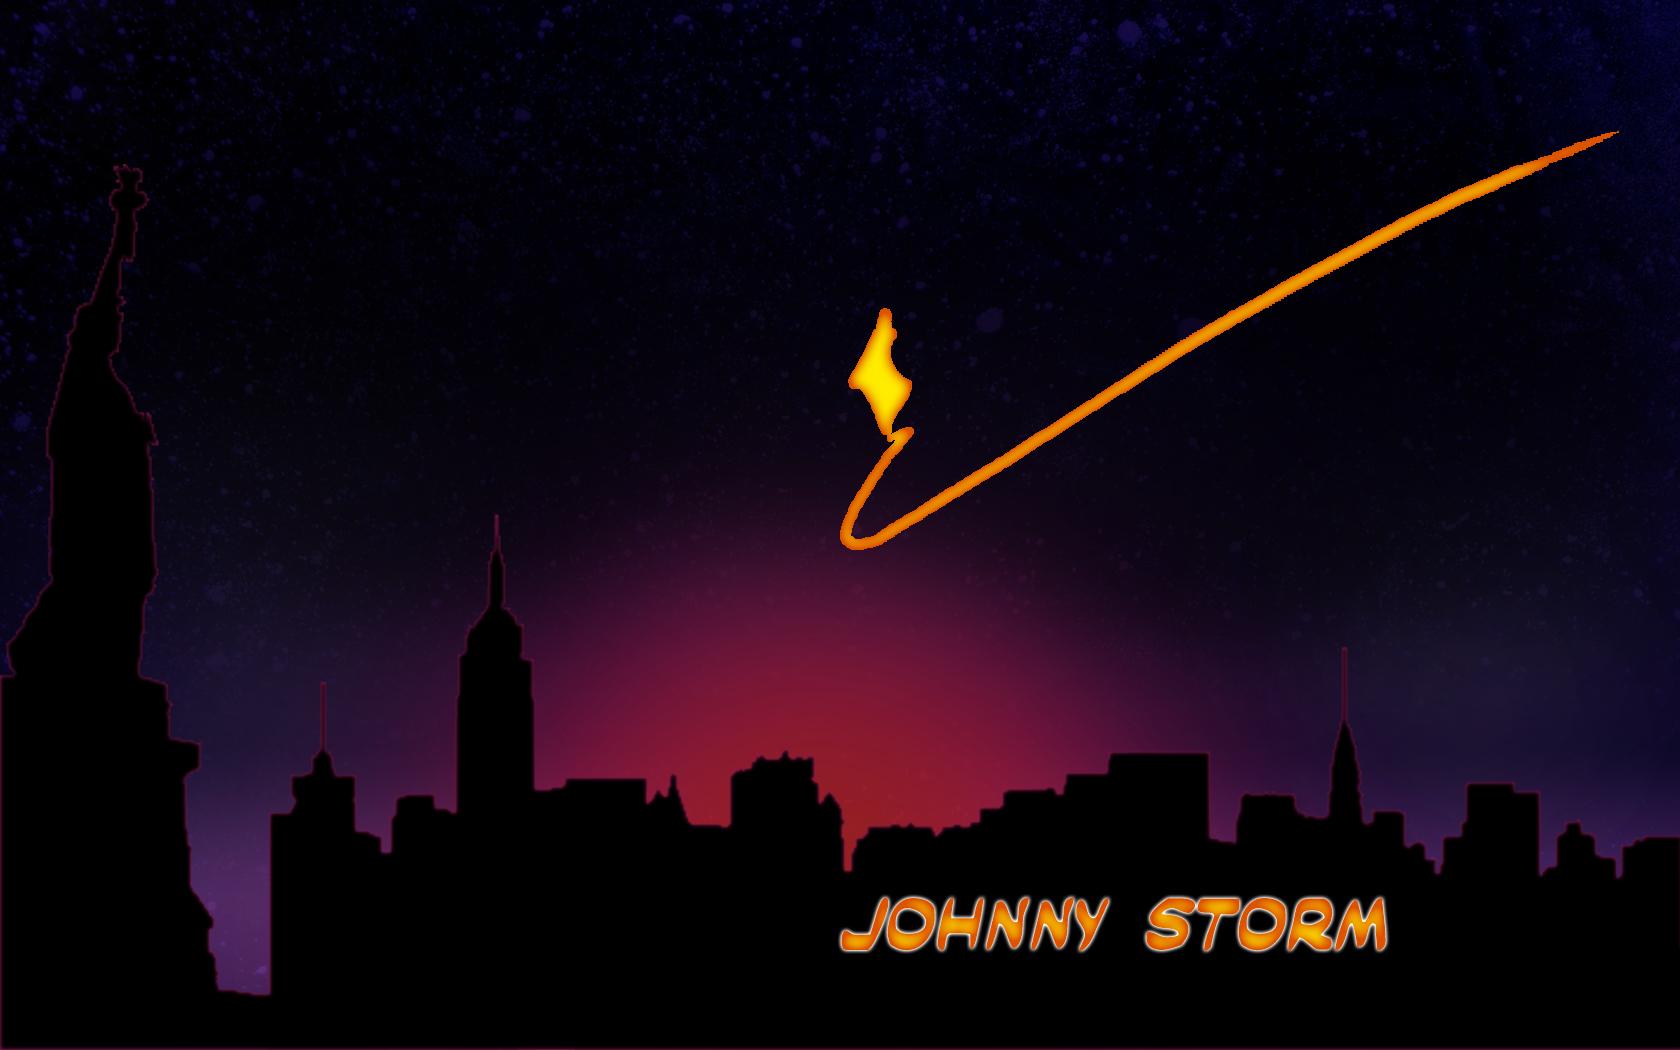 Johnny Storm By Clu-art On DeviantArt